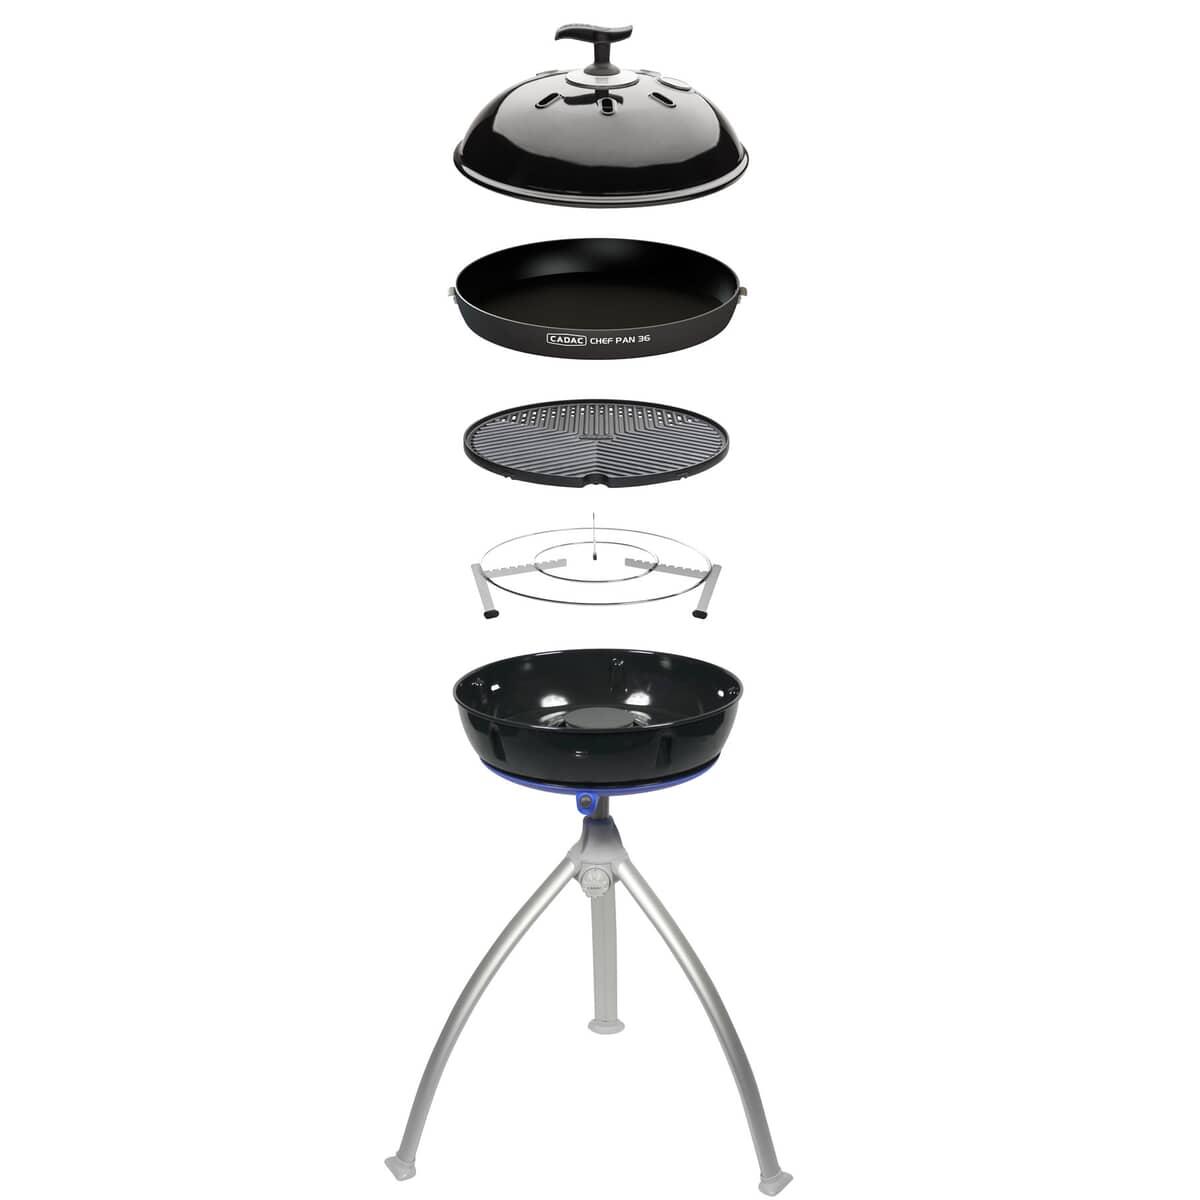 Cadac Carri Chef 2 Bbq Skottel Combo.Cadac Grillo Chef 2 Bbq Chef Pan Combo Gas Bbq